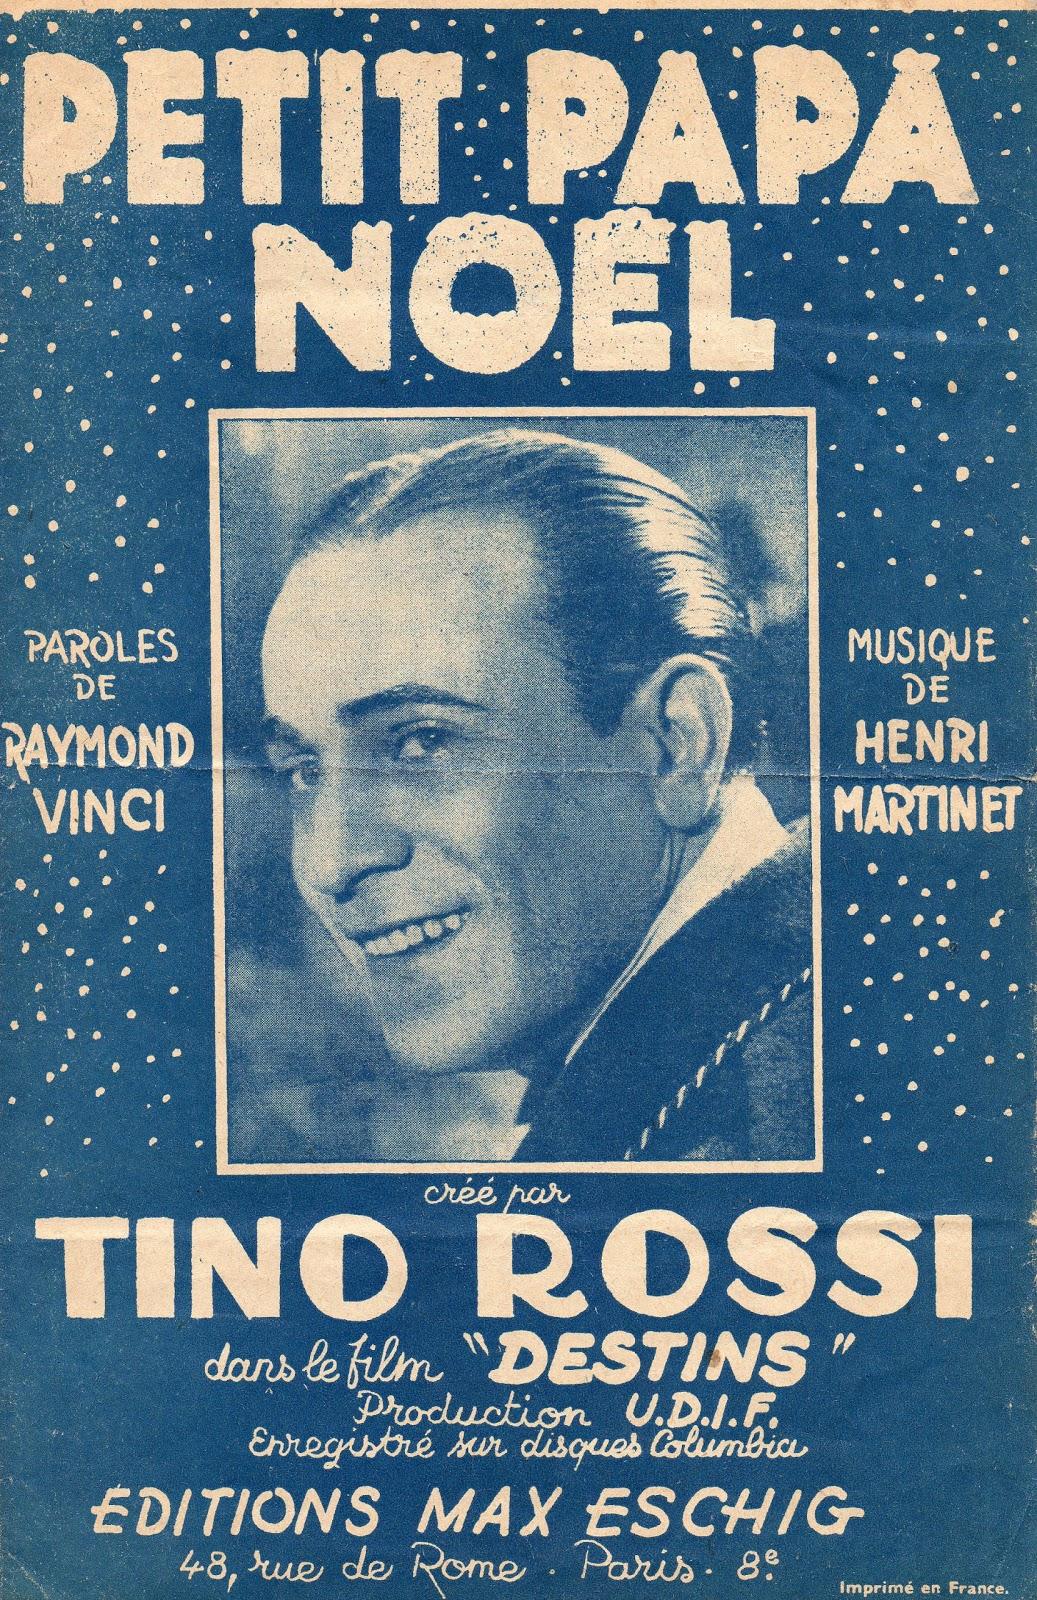 Cin�� Musique: Tino Rossi - Petit Papa No��l